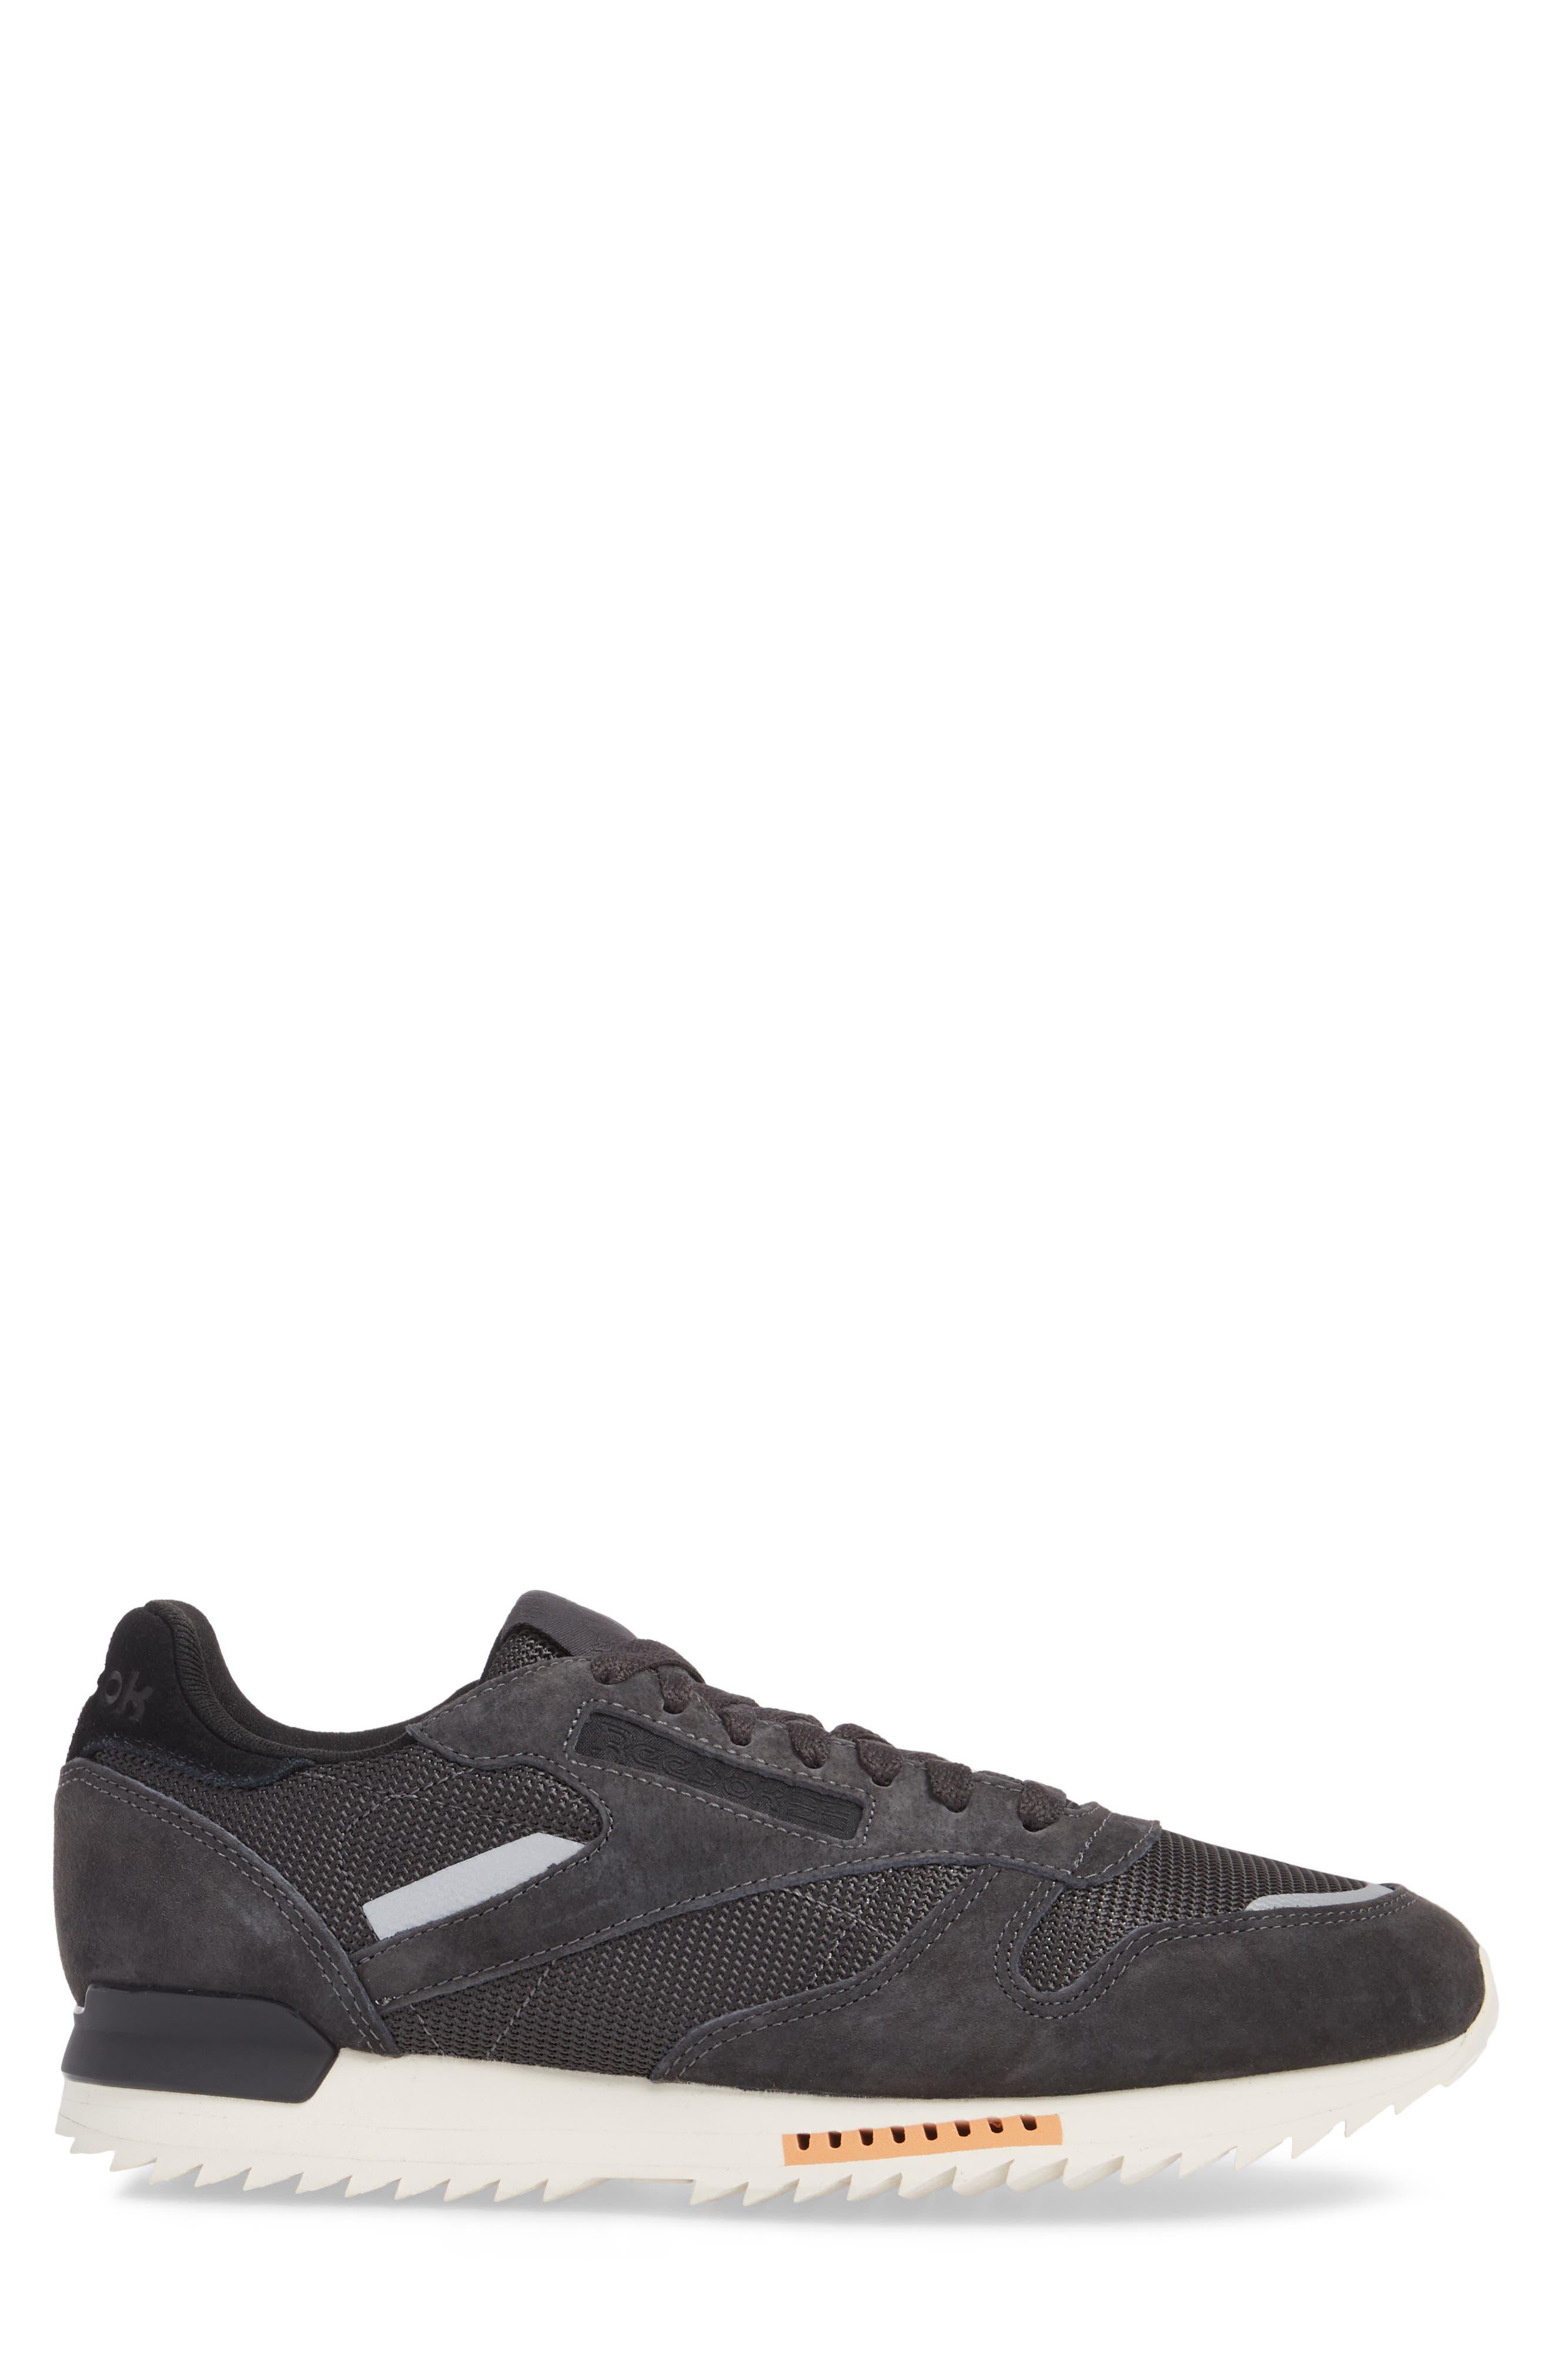 Classic Leather Ripple Sneaker,                             Alternate thumbnail 3, color,                             Coal/ Grey/ White/ Black/ Dust